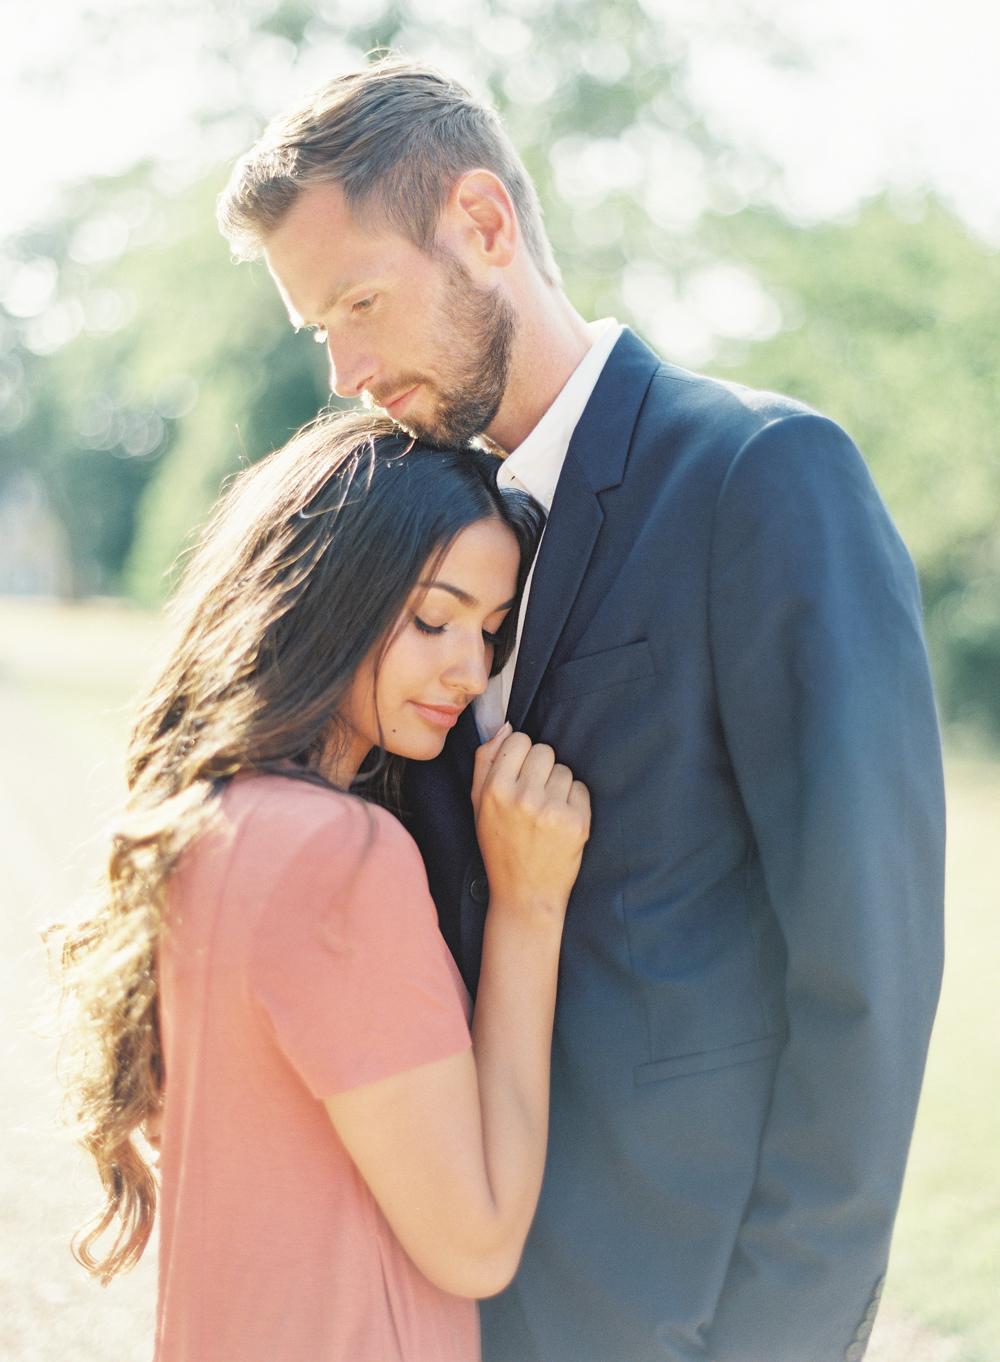 Fine art film wedding photographer, Washington DC, virginia, maryland, destination wedding, Chateau de Bouthonvilliers, Dangeau, France